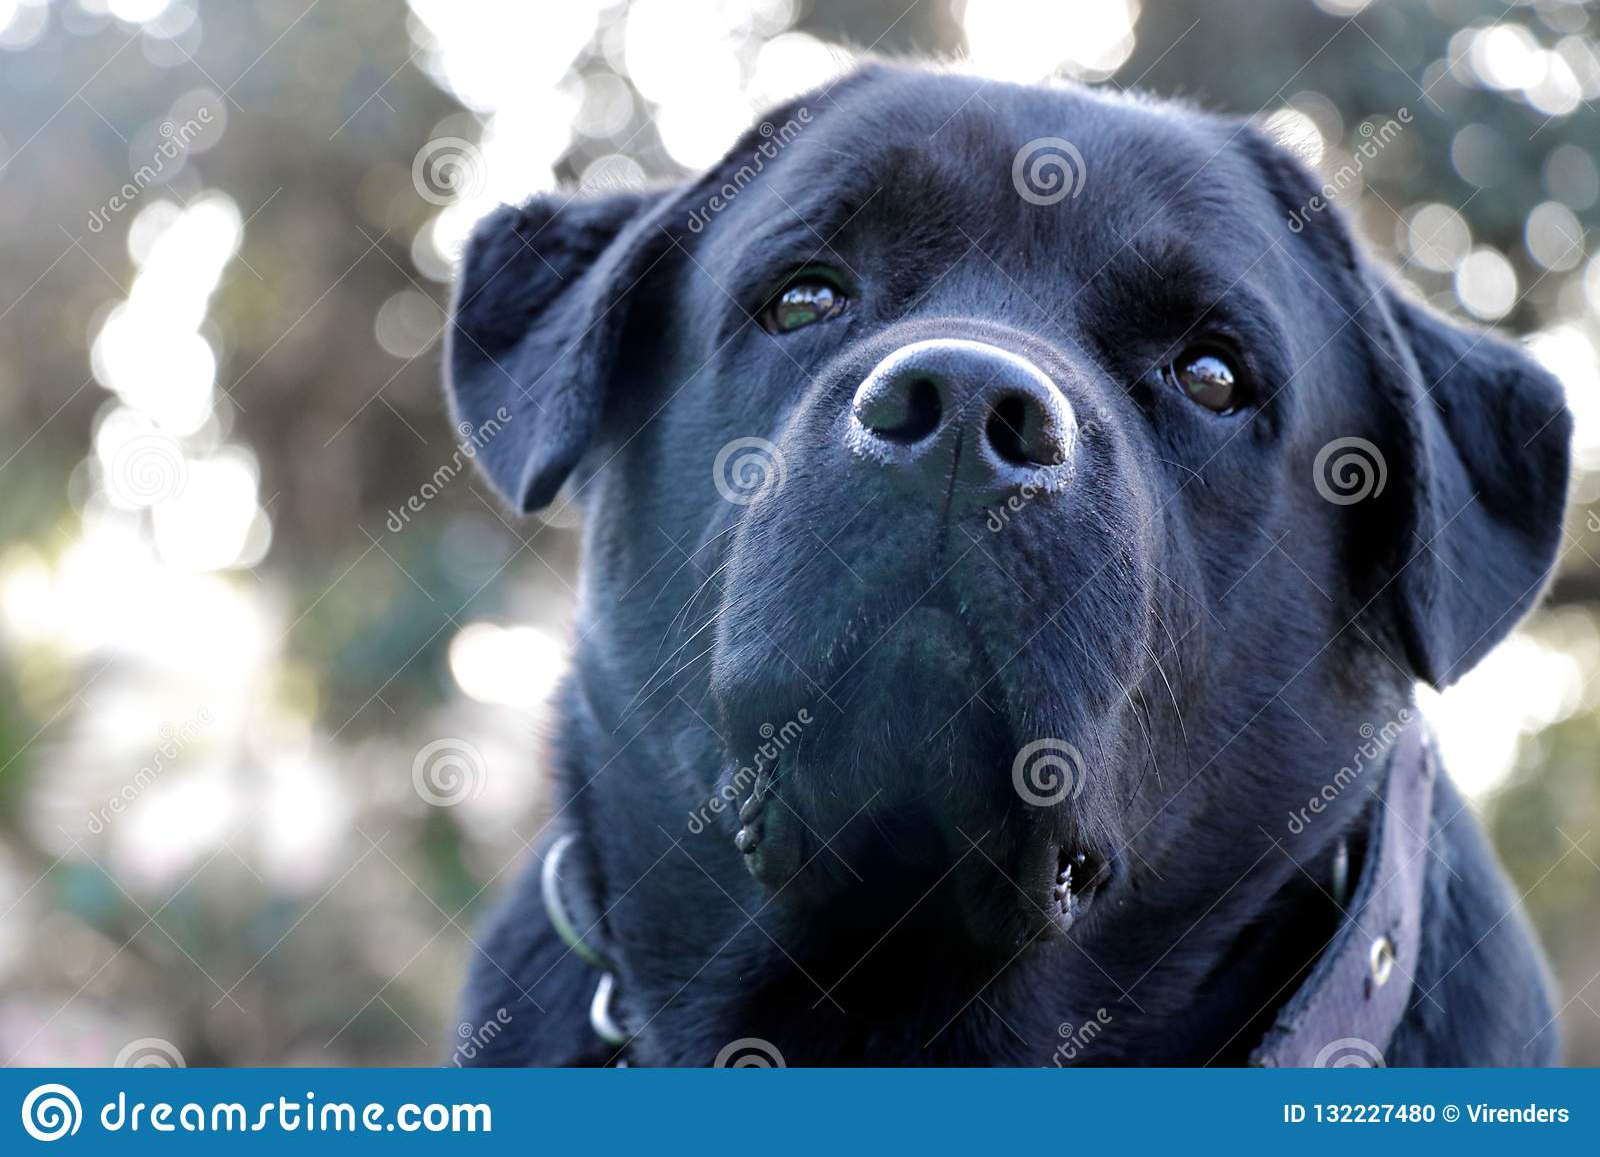 Black labrador dog face close-up, looking strangely